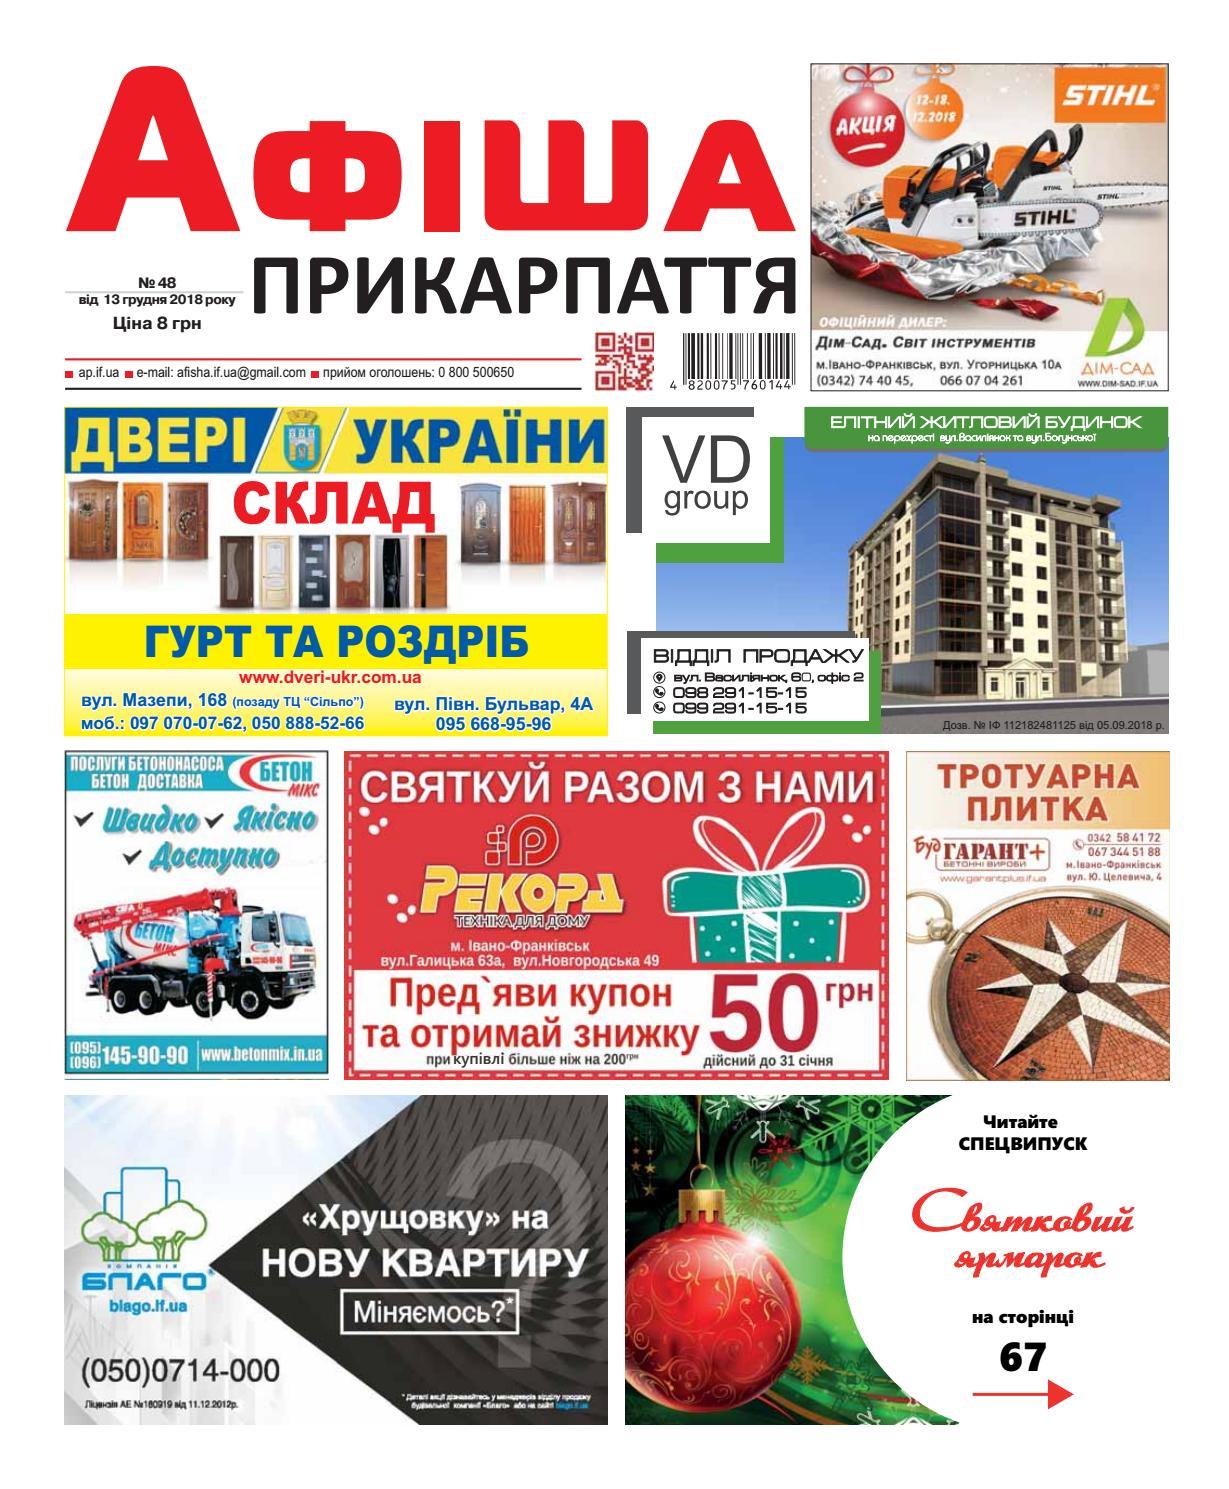 Афіша Прикарпаття №48 by Olya Olya - issuu d3e071af3175d